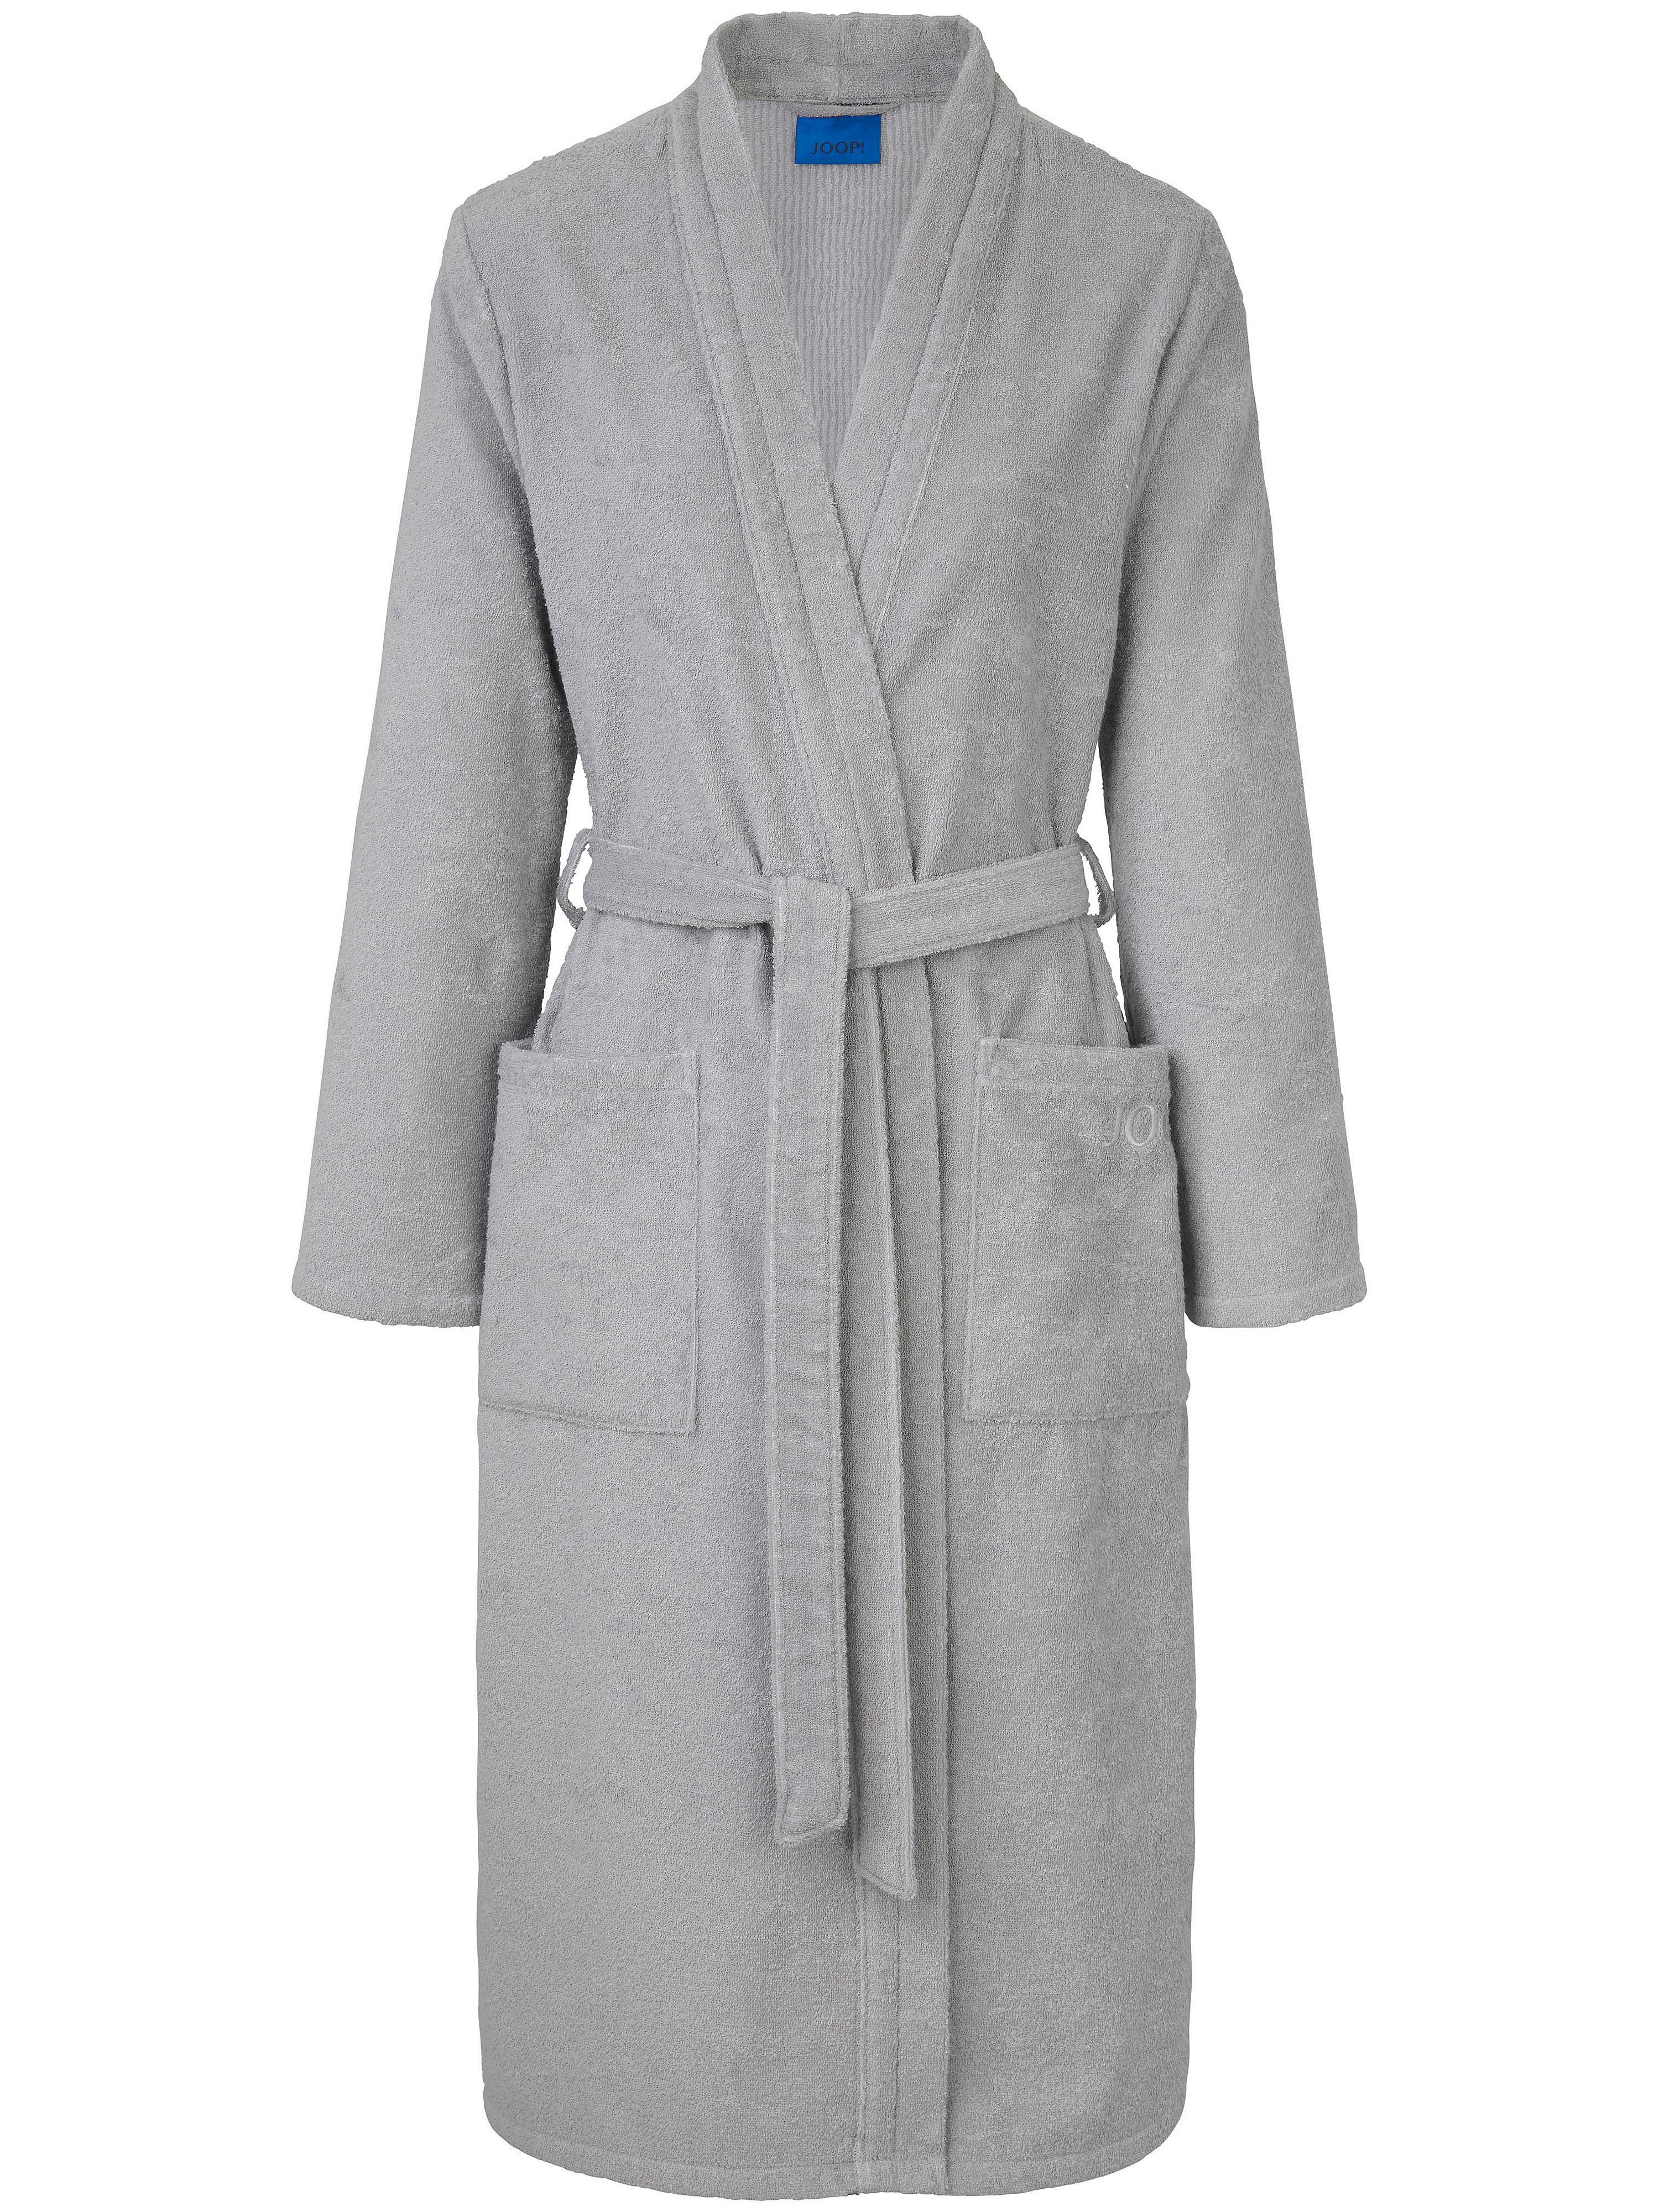 Bademantel in Kimono-Form Joop! silber | Bekleidung > Bademode > Bademäntel | Joop!